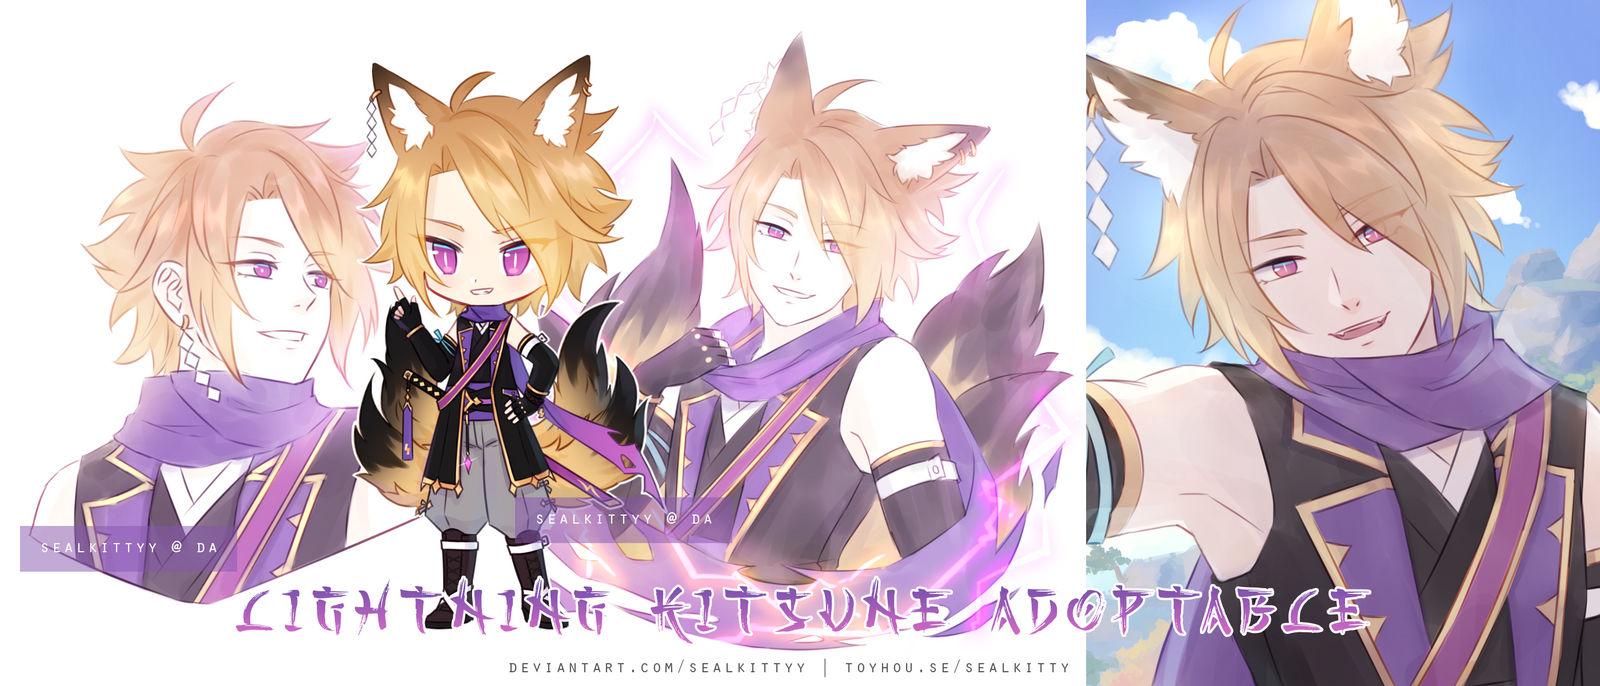 _preclaimed__lightning_kitsune_by_sealki